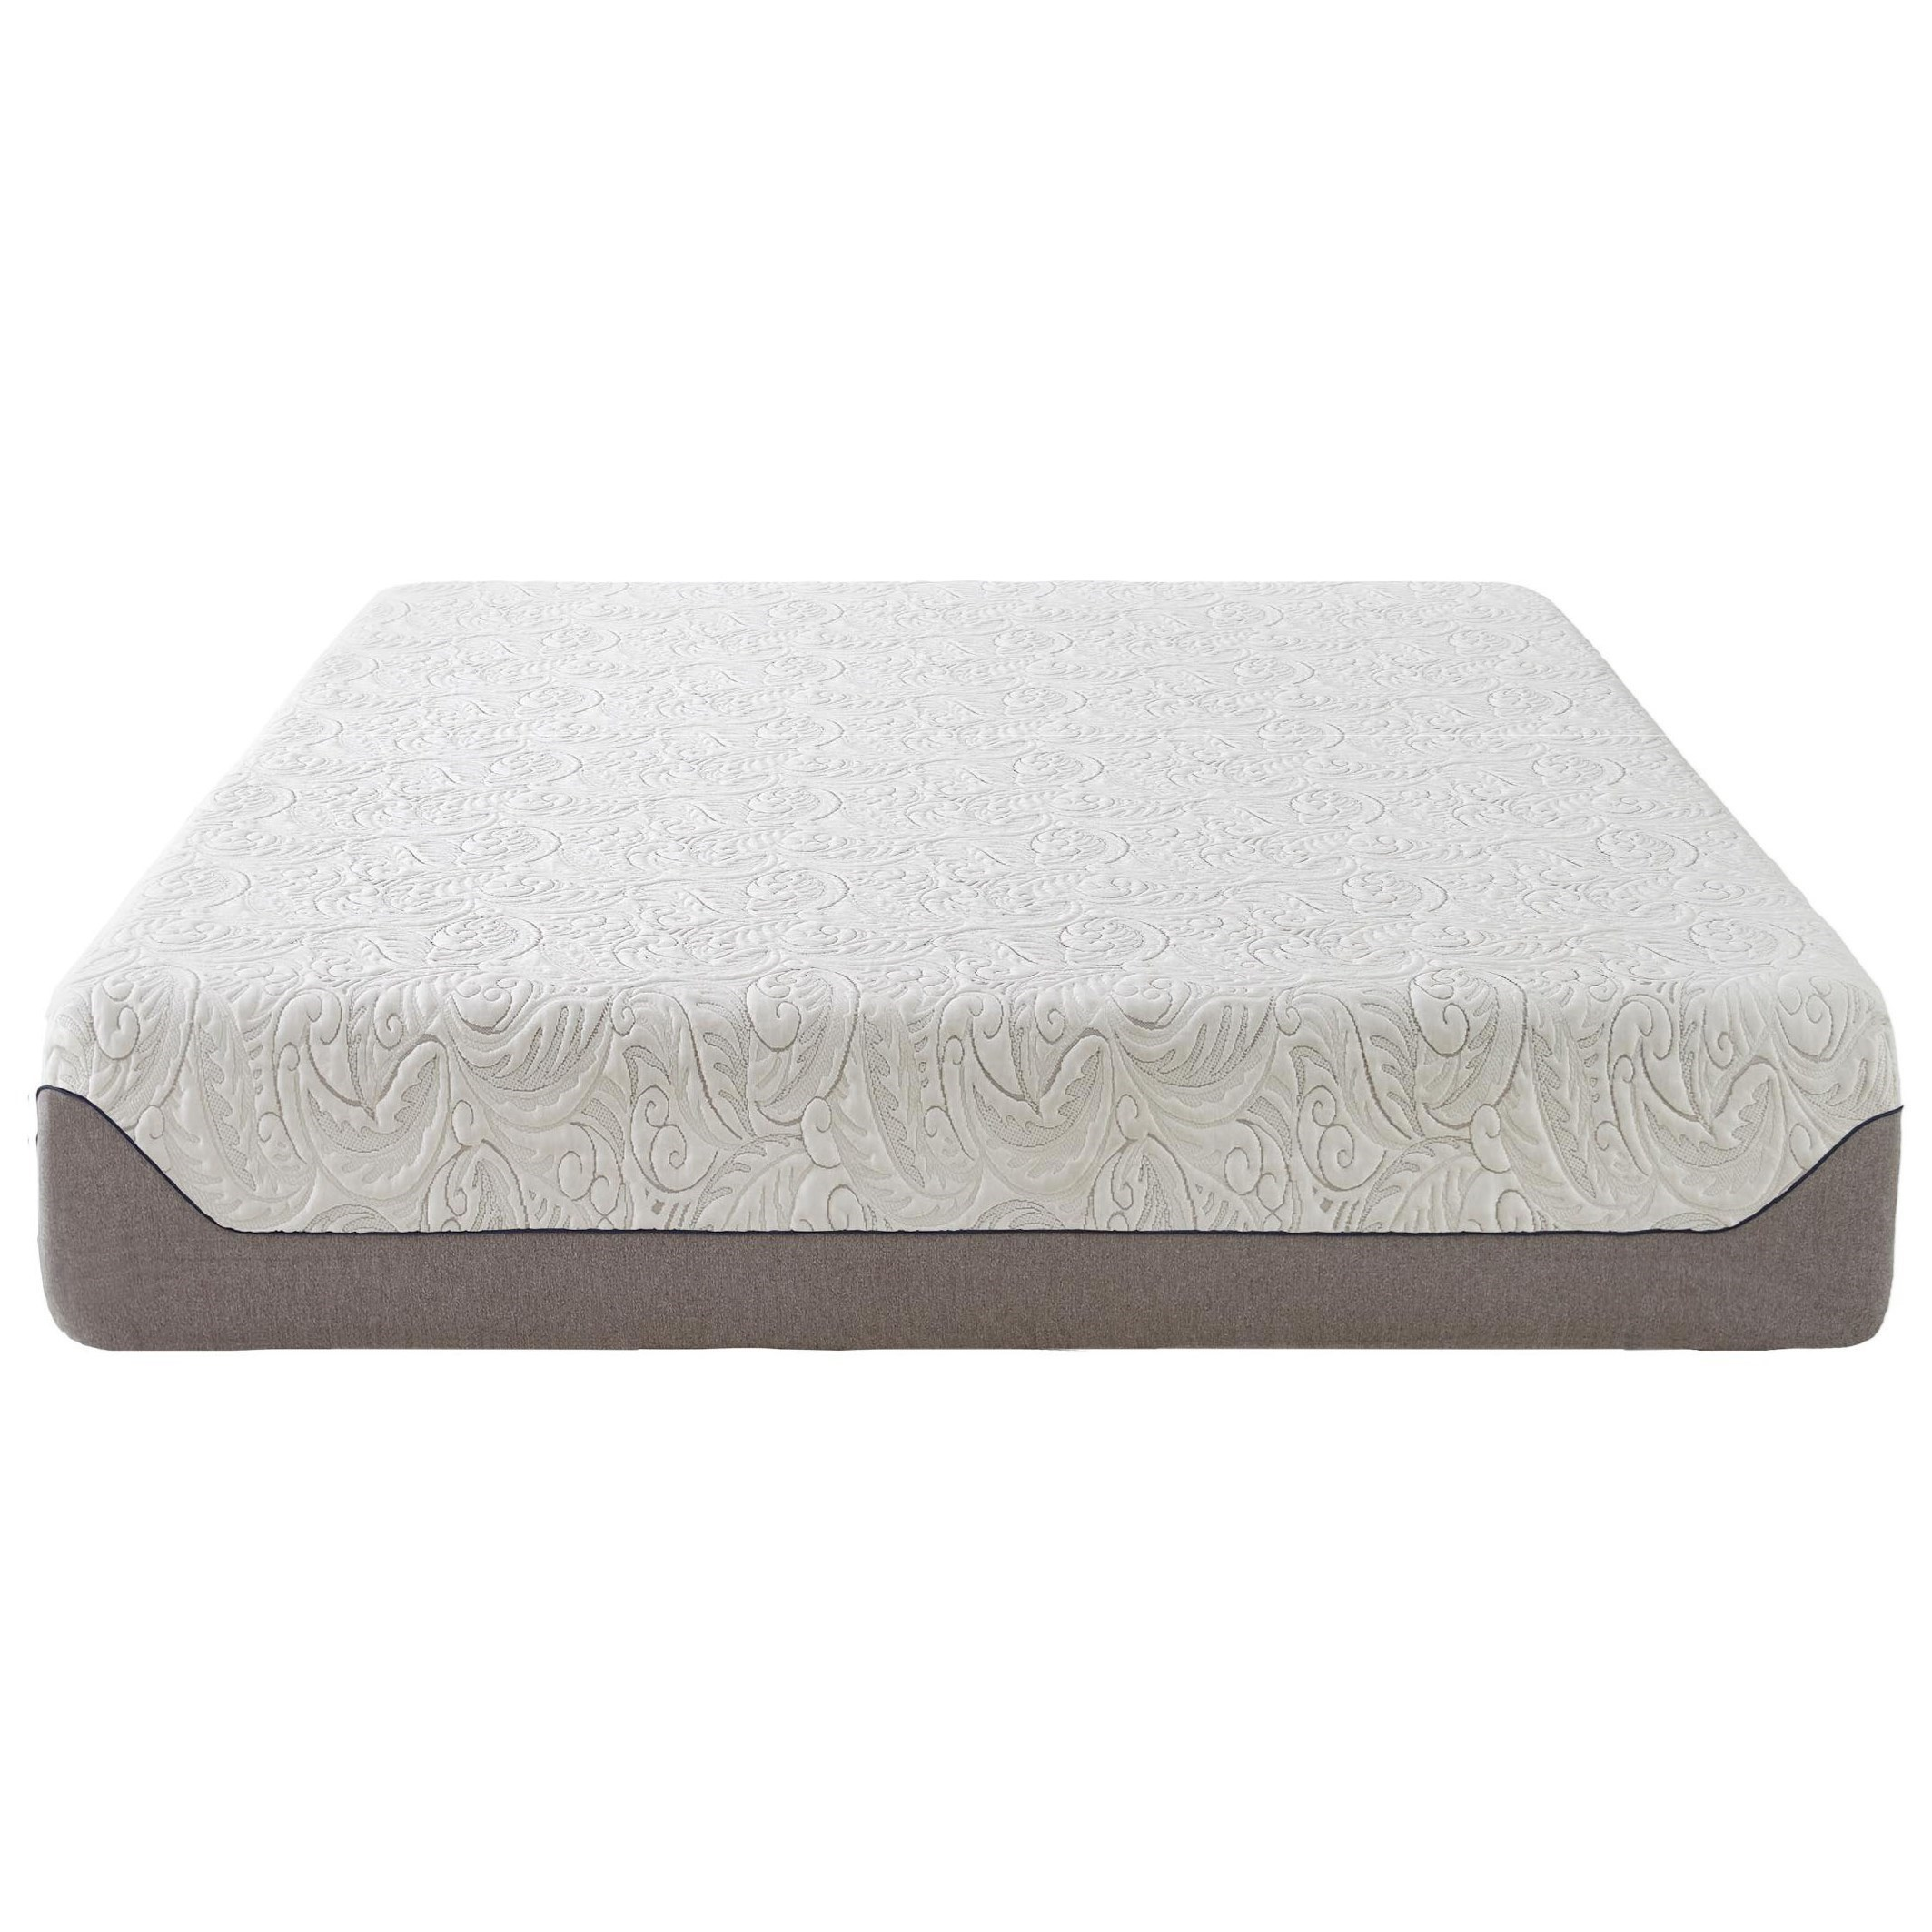 "5083 Ventura Grande Full 8"" Gel Memory Foam Mattress by Boyd Specialty Sleep at Beds N Stuff"